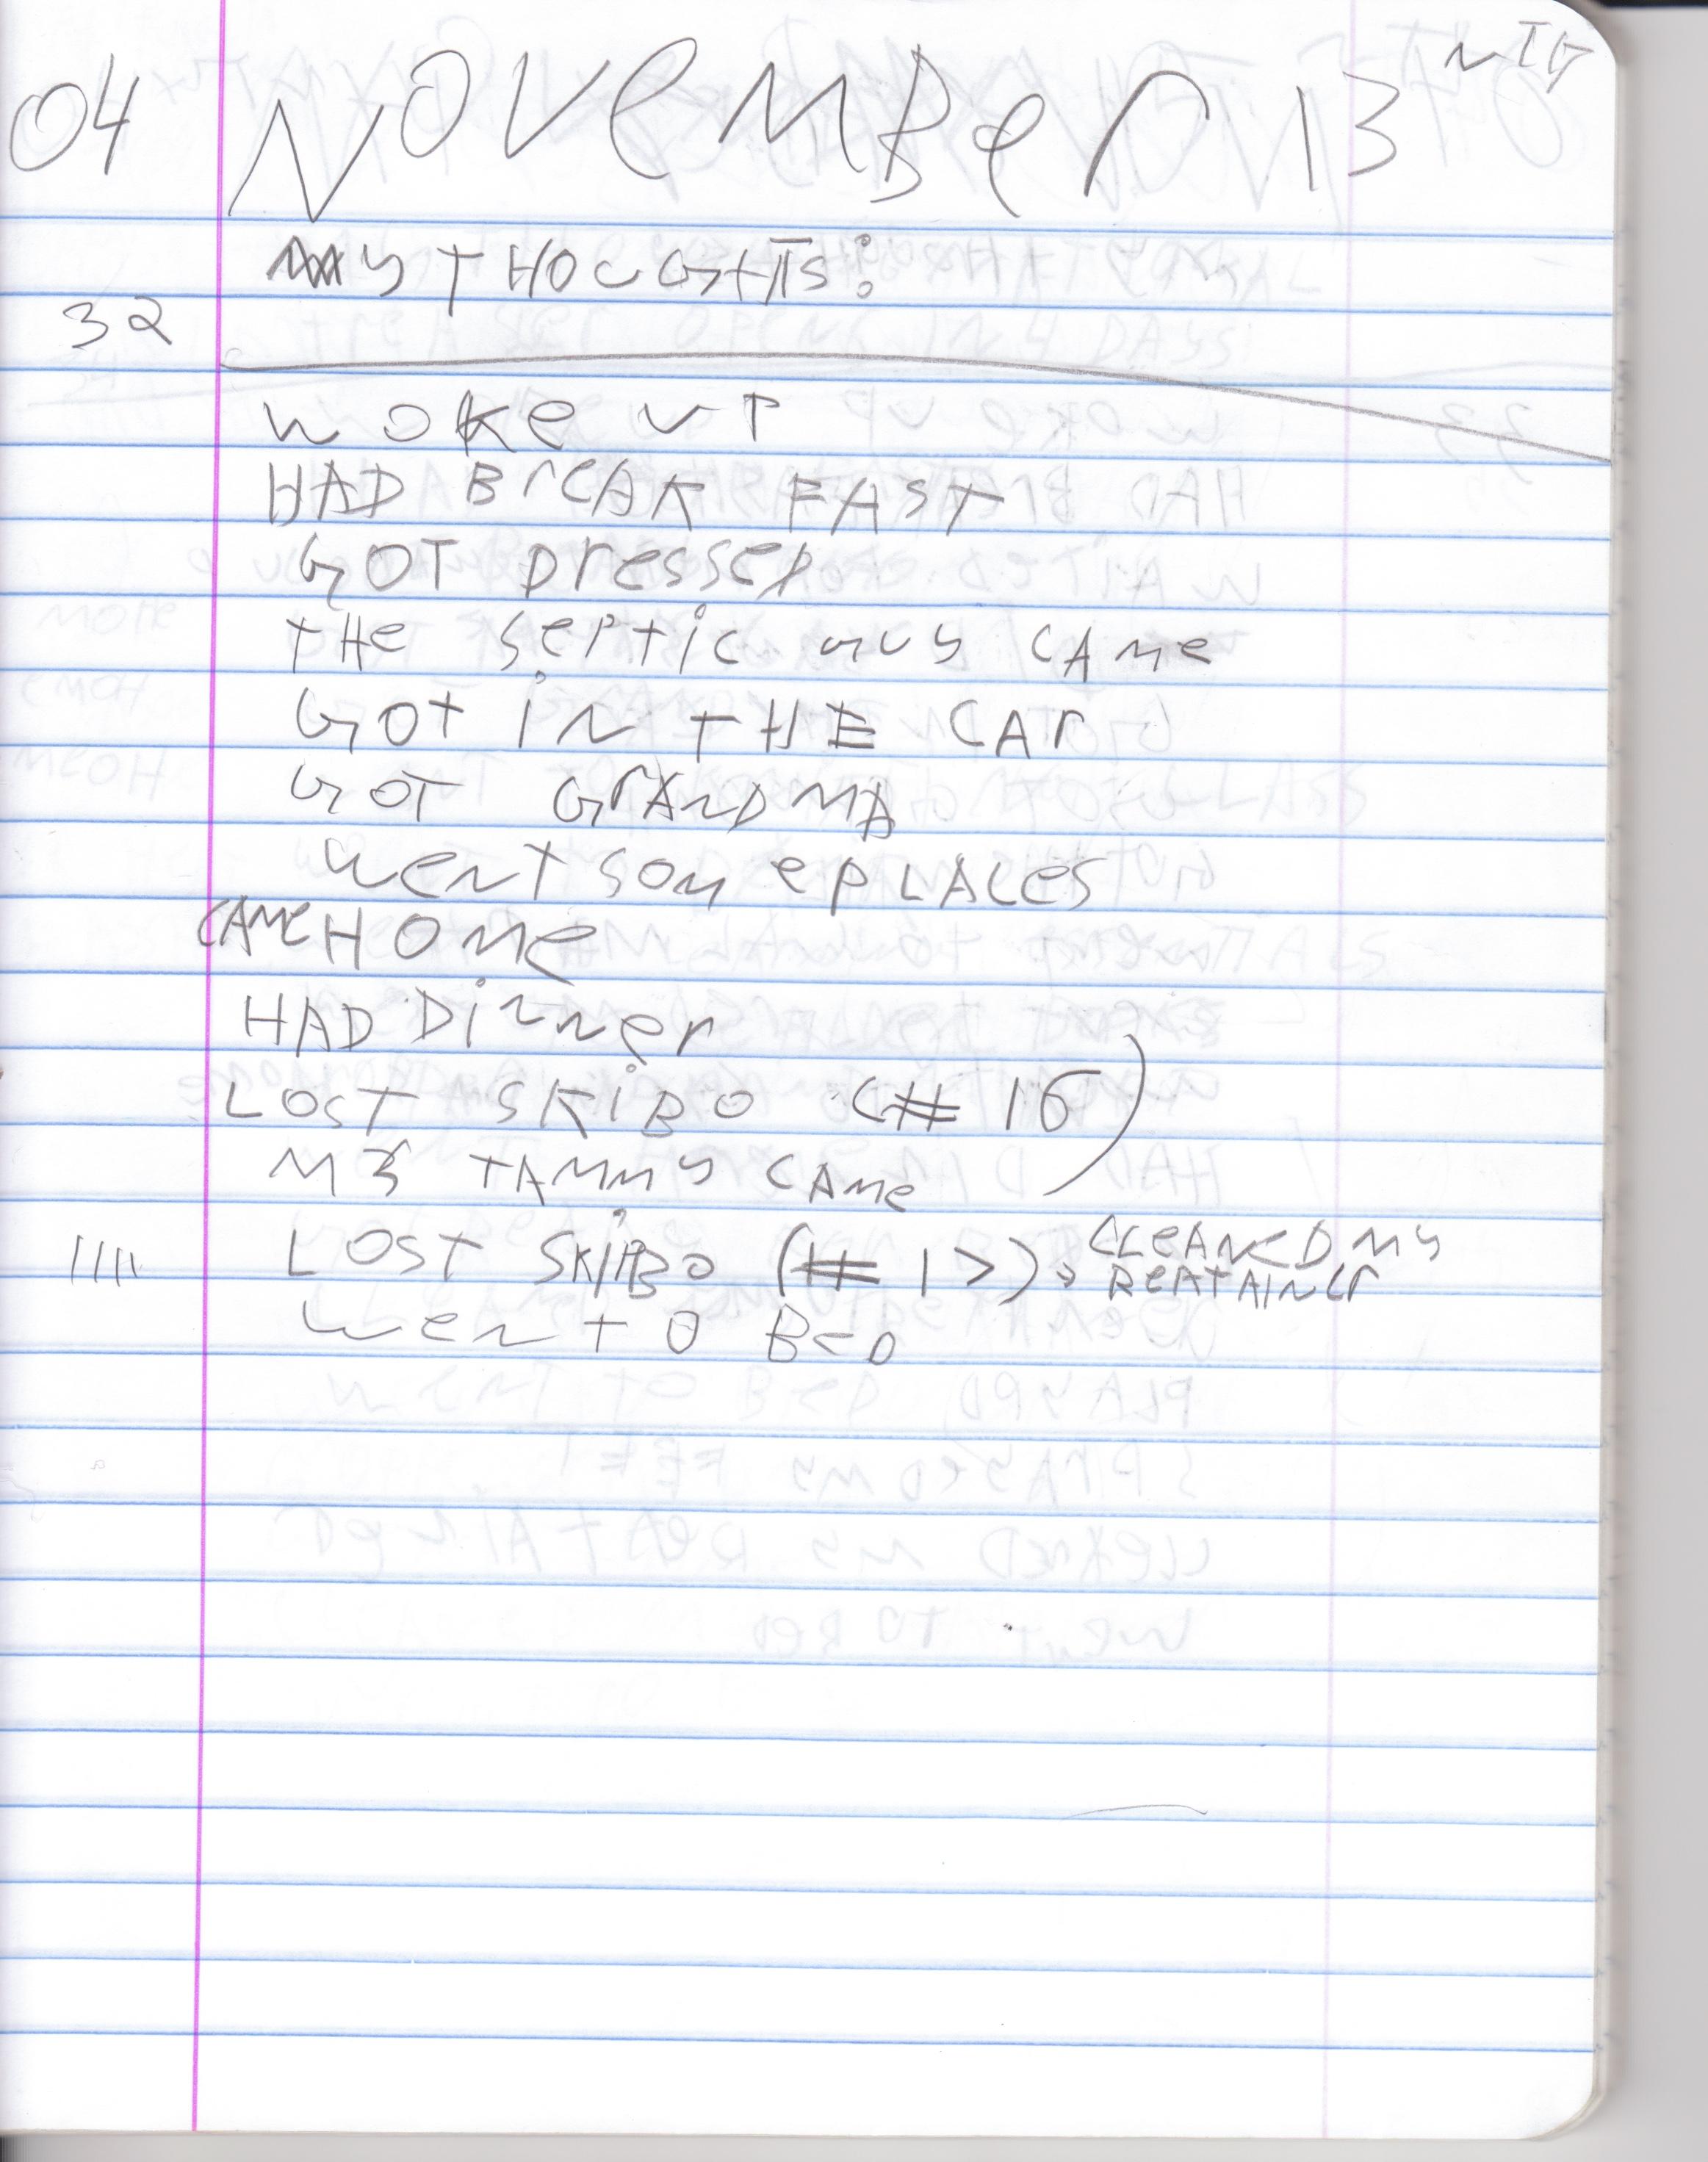 my first diary-log_Page_035.jpg